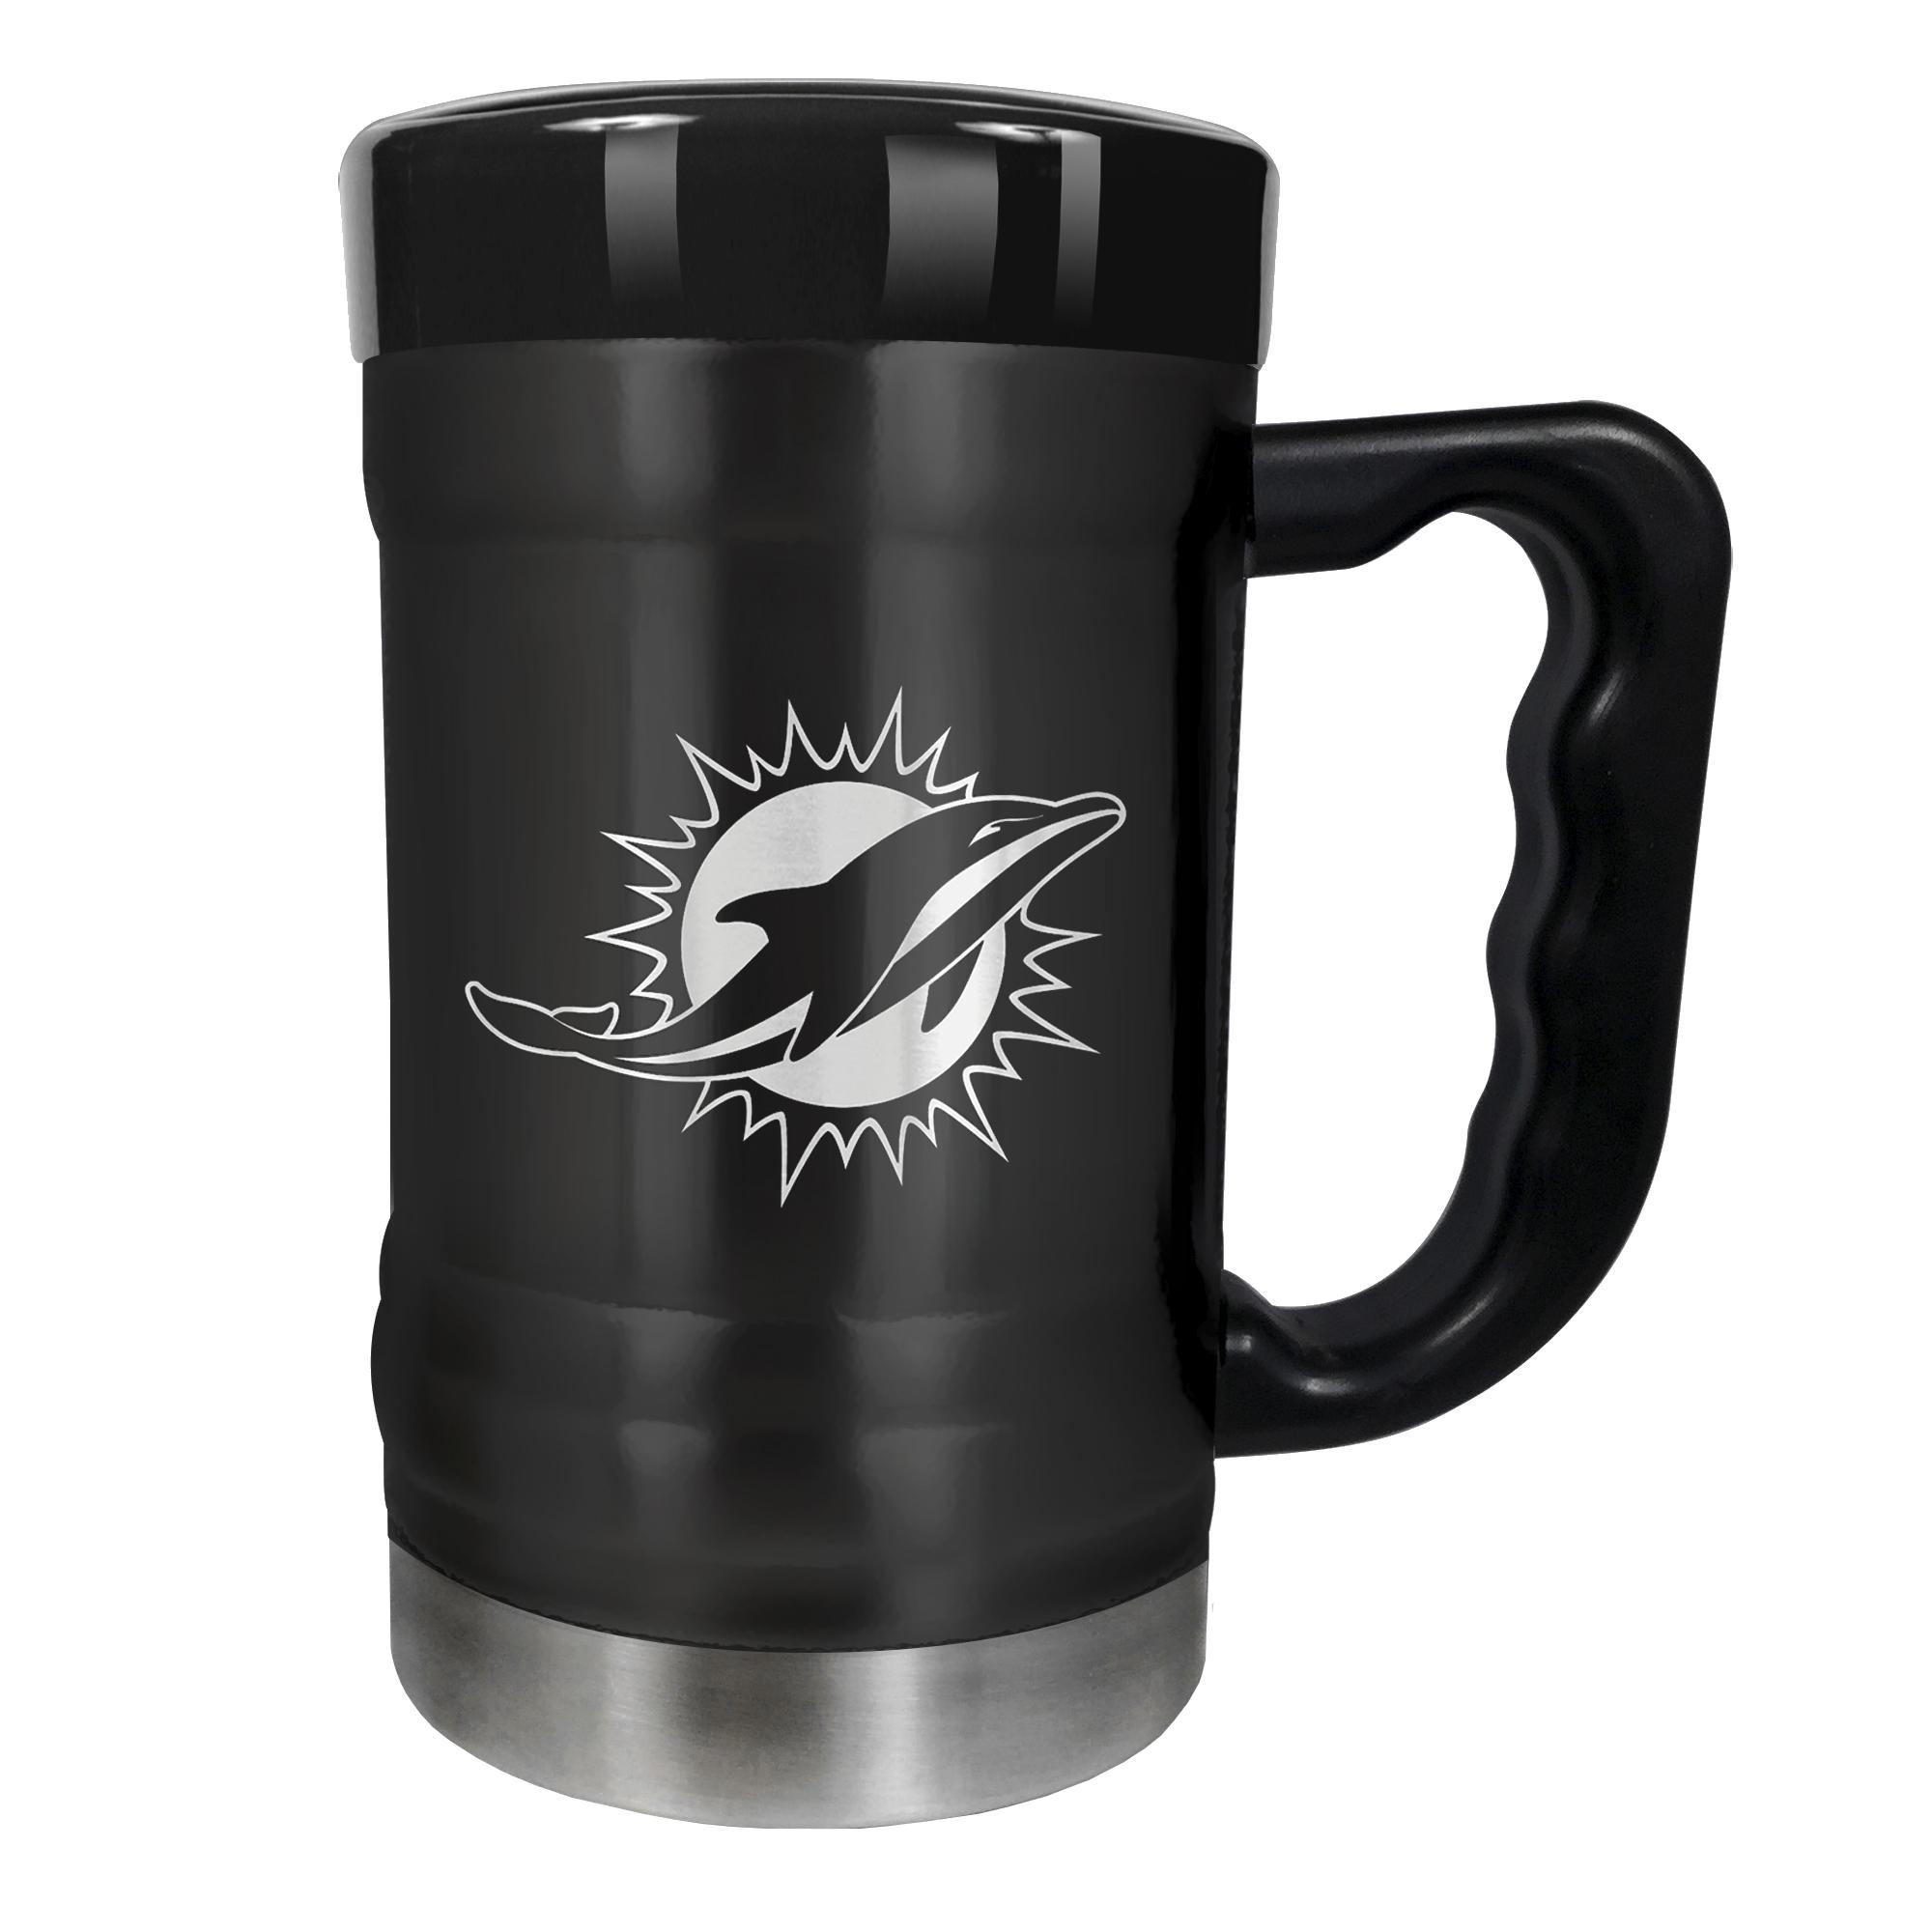 Miami Dolphins 15oz. Stealth Coach Coffee Mug - Black - No Size